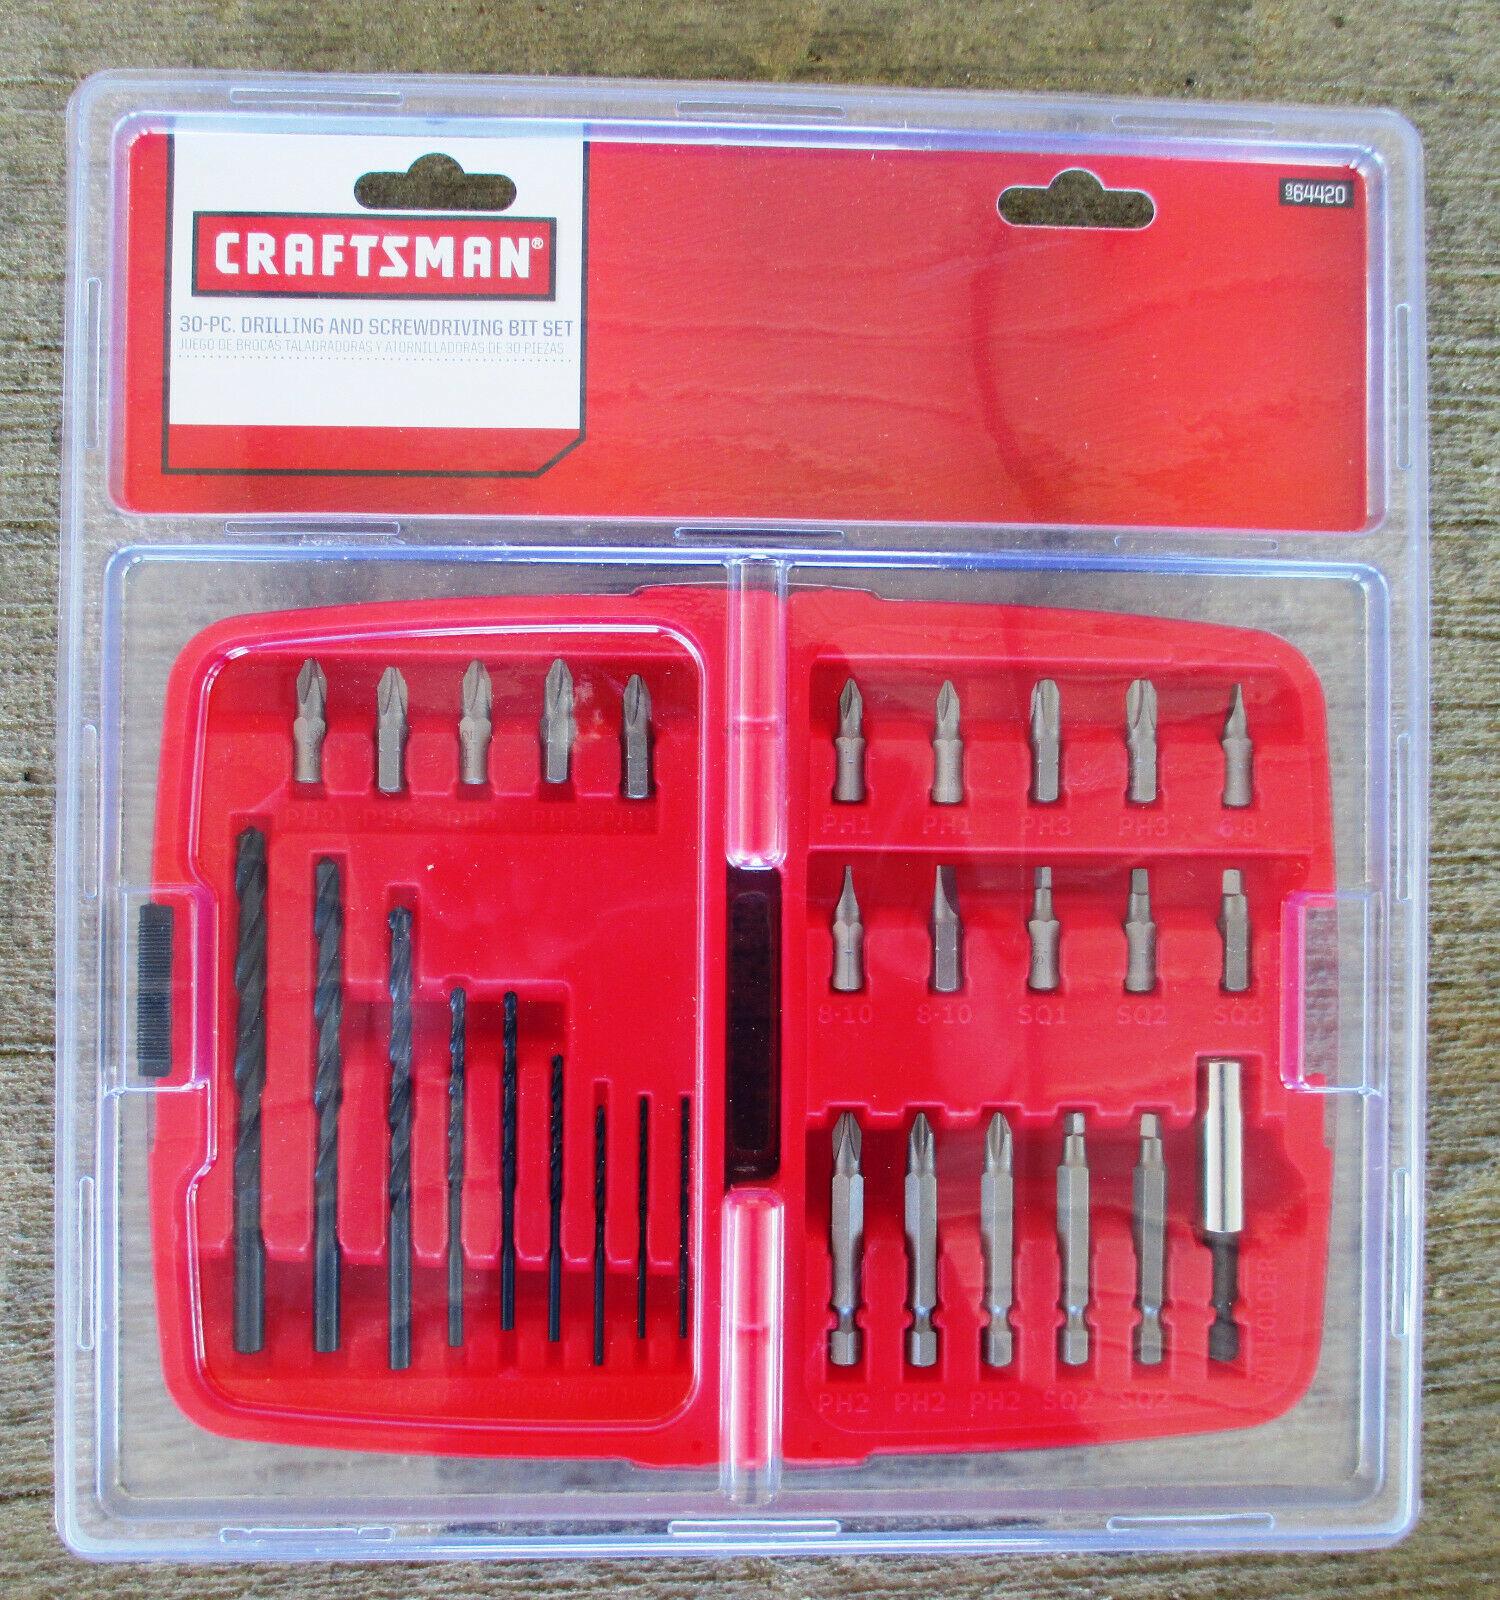 Craftsman 30 Piece Drilling and Screwdriving Bit Set 64420 - $12.20